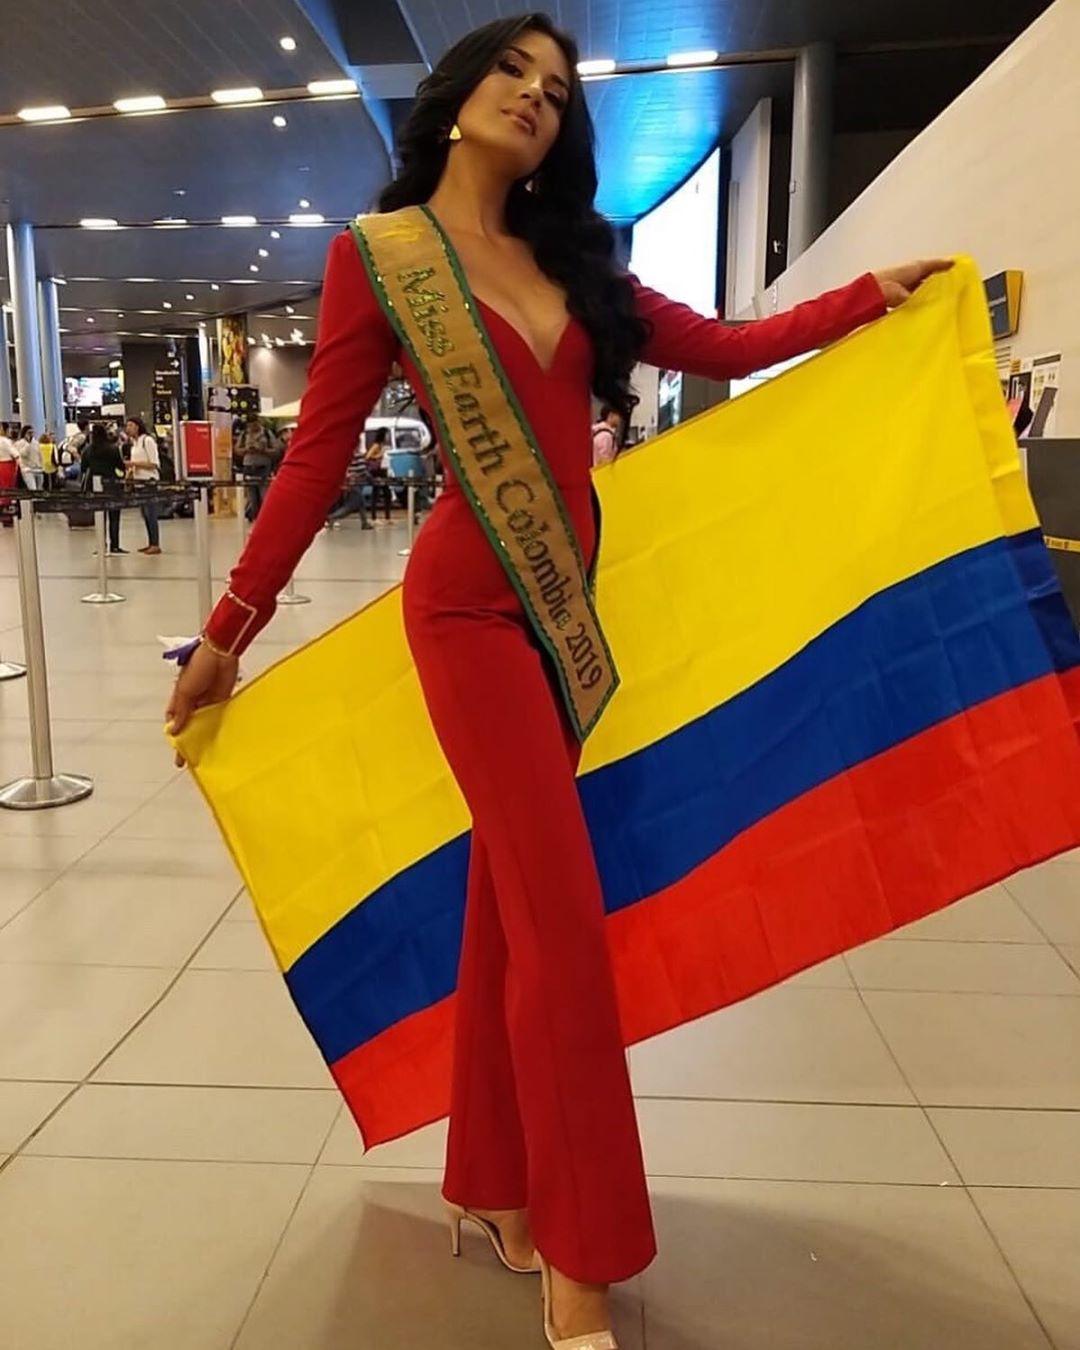 yenny katherine carrillo, top 20 de miss earth 2019/reyna mundial banano 2017. - Página 6 71078210